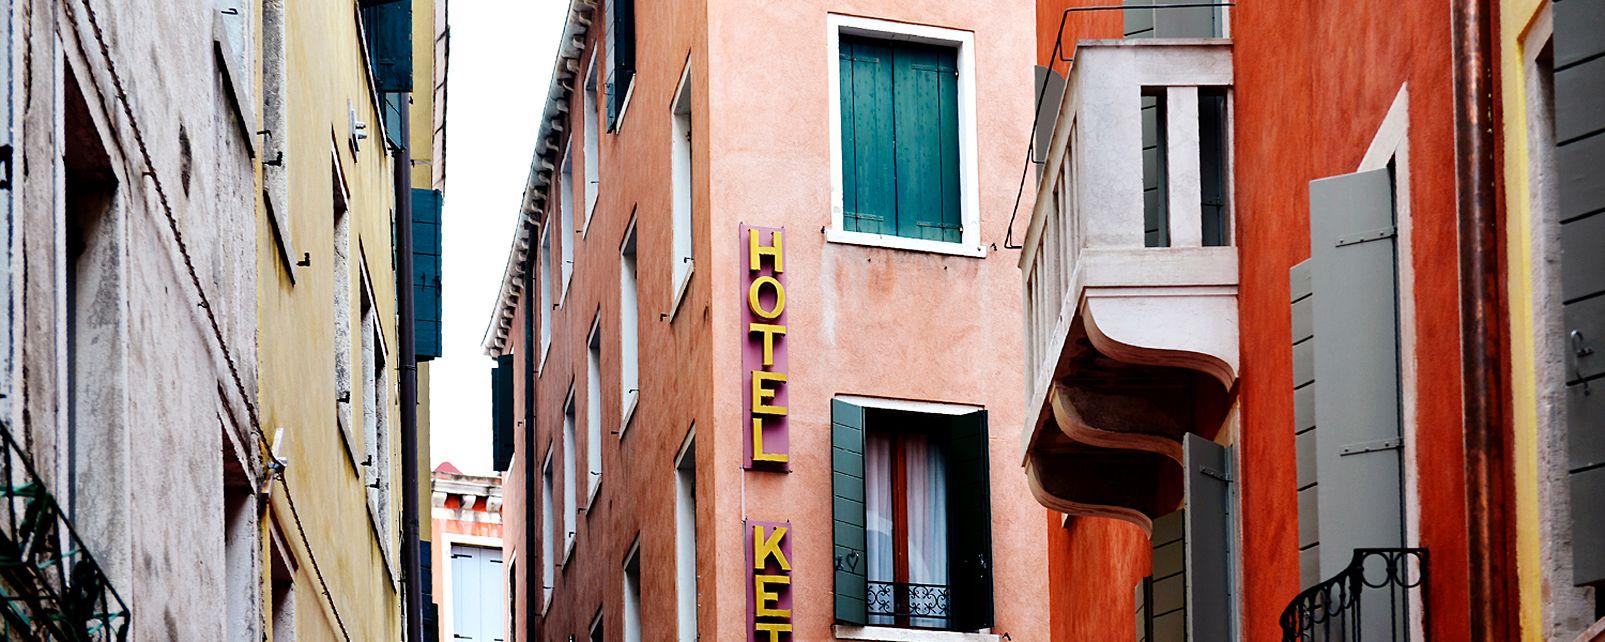 Hotel Kette